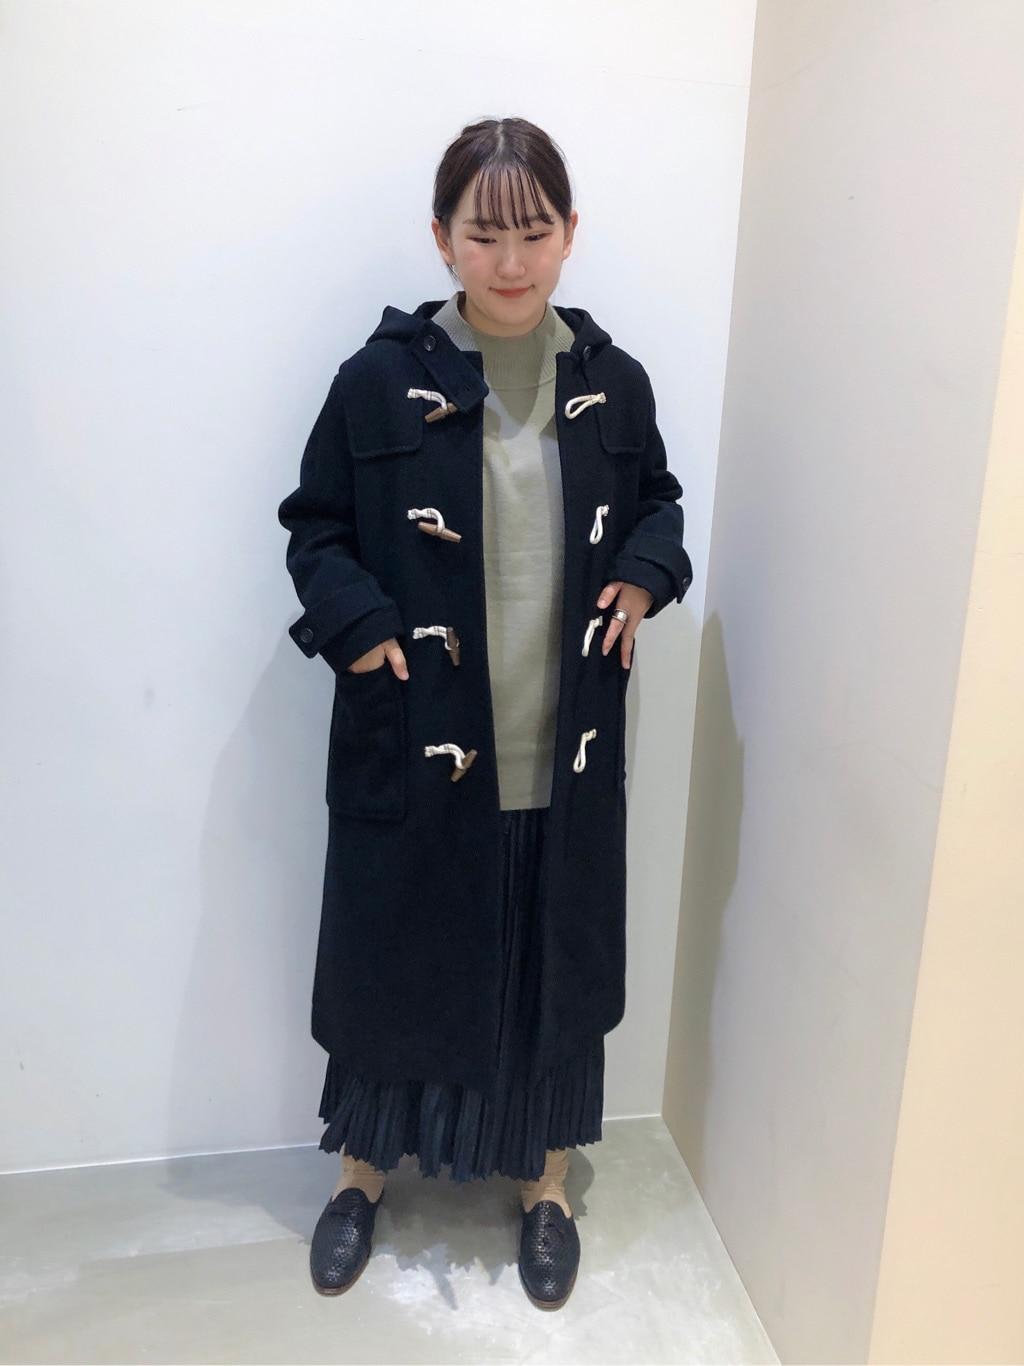 bulle de savon 阪急西宮ガーデンズ 身長:166cm 2020.10.06